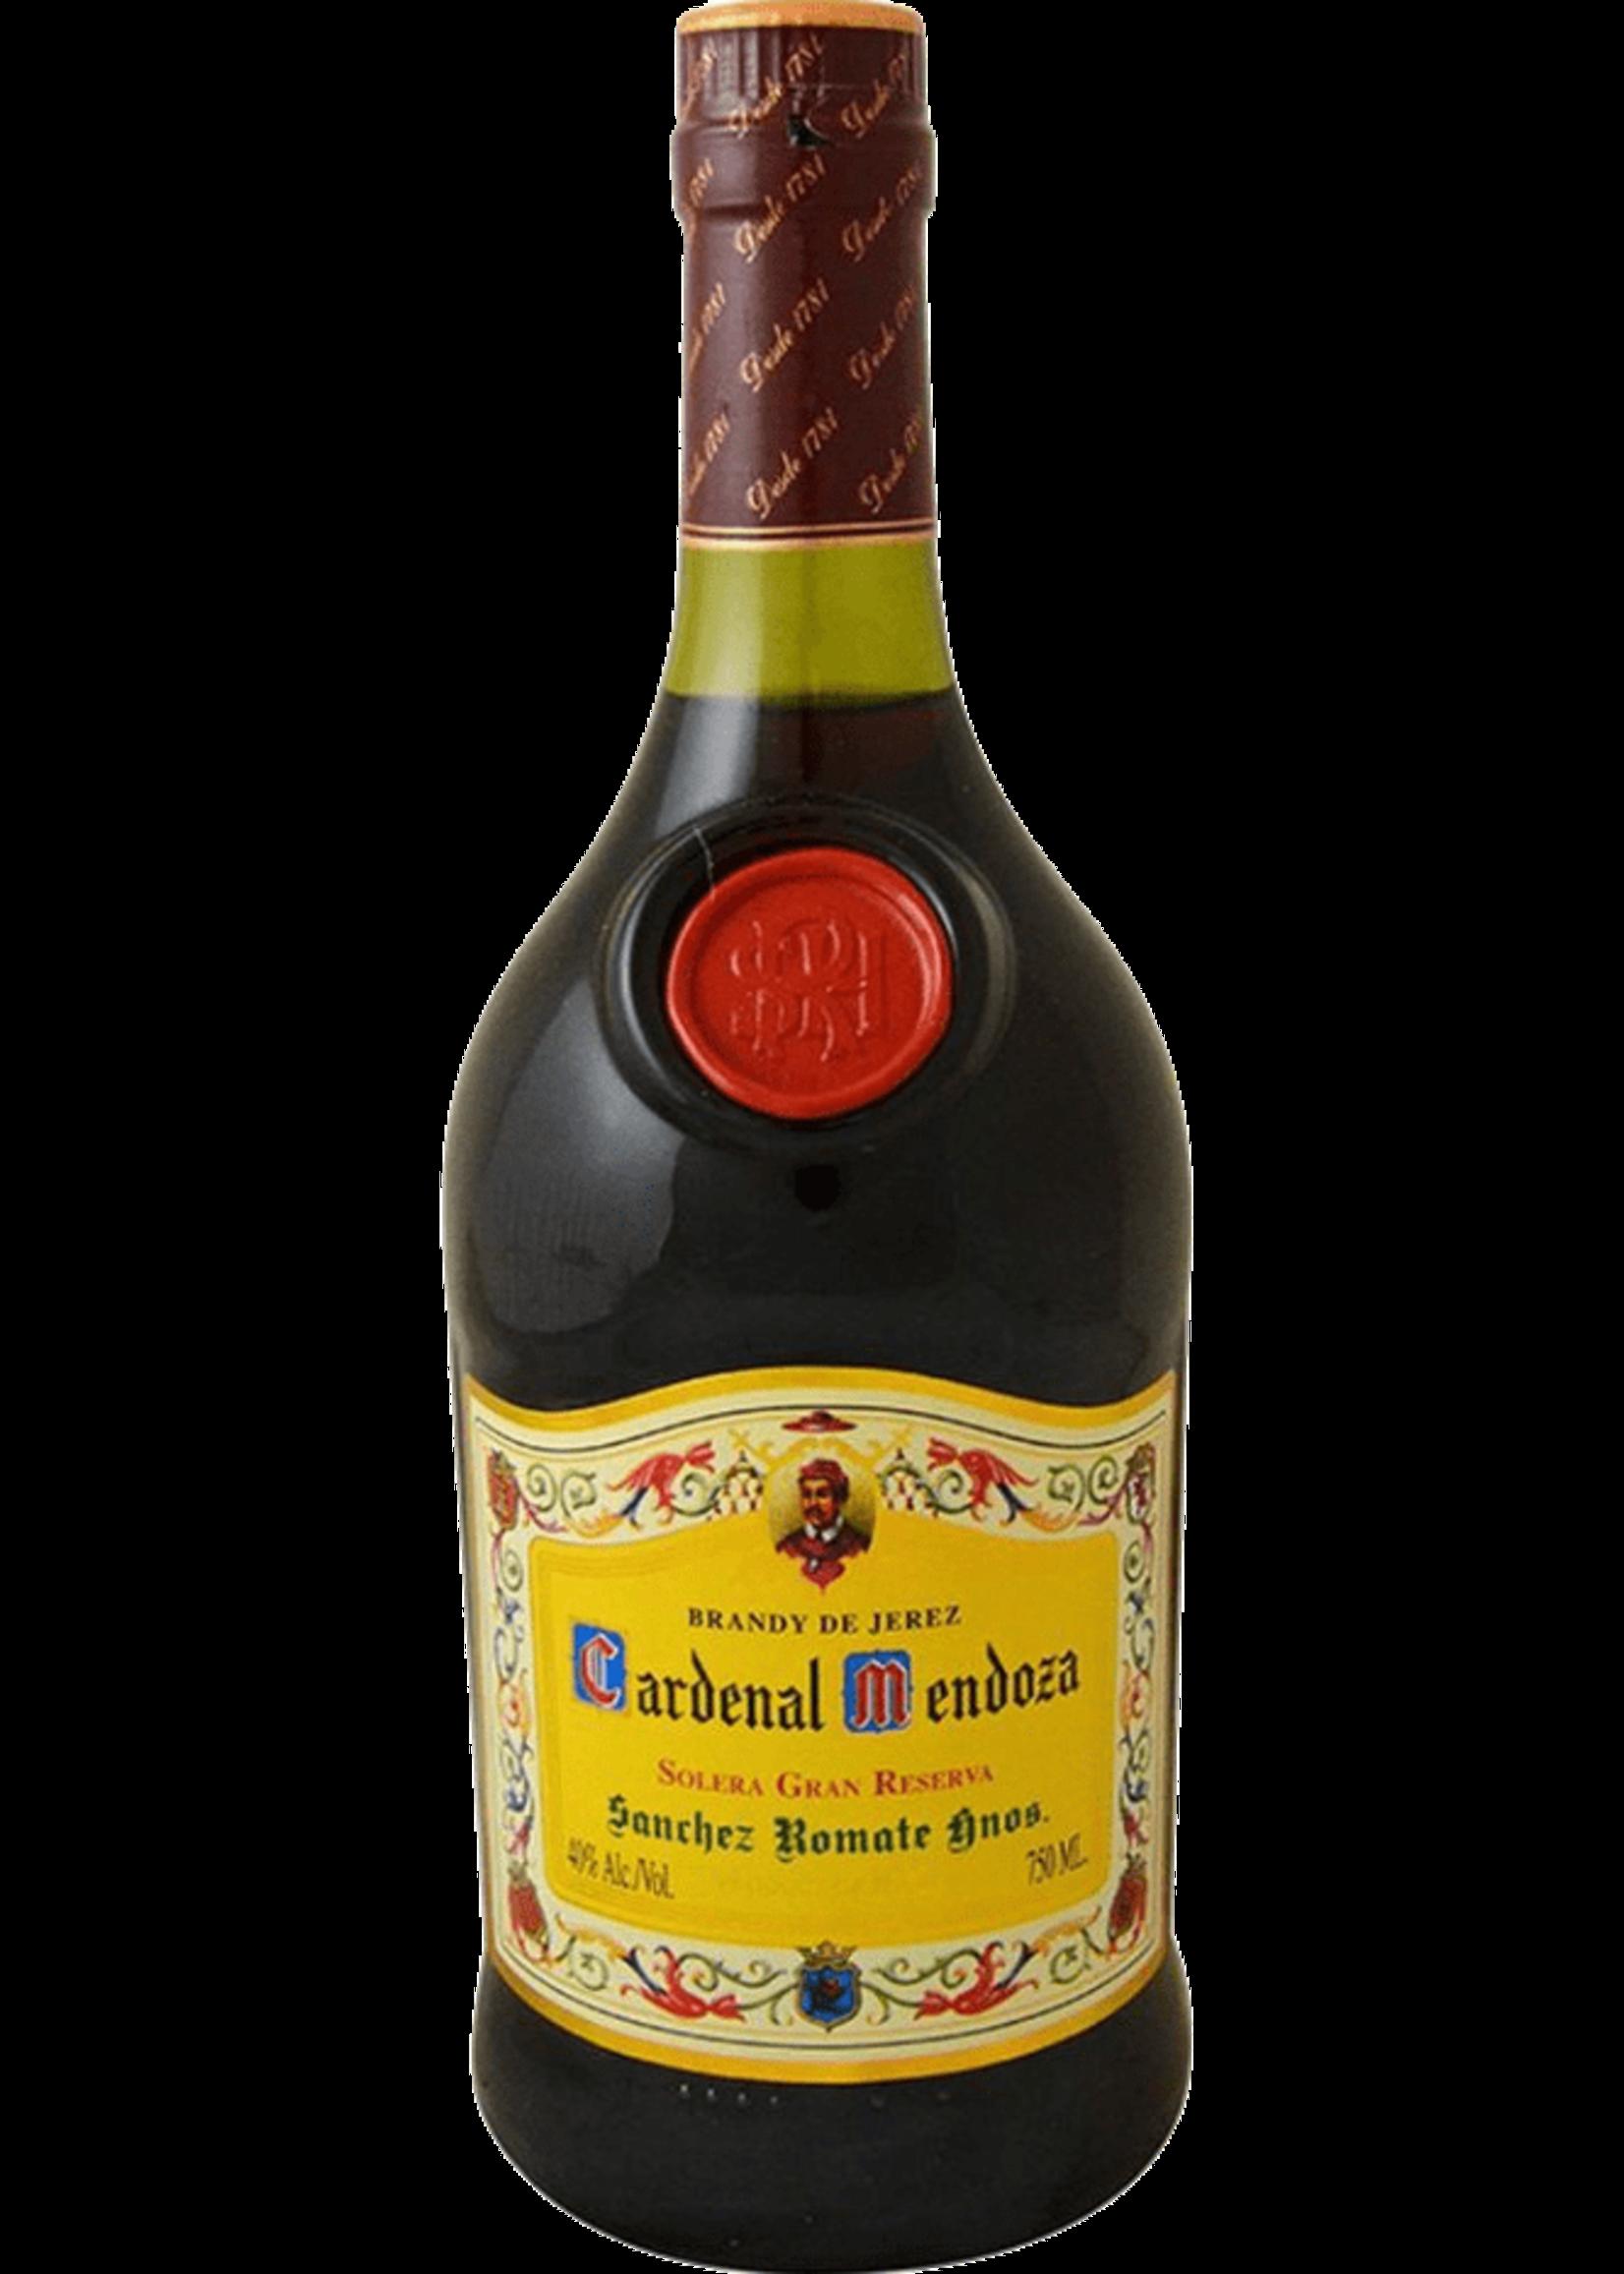 CARDENAL MENDOZA Cardenal Mendoza / Spanish Brandy / 750mL